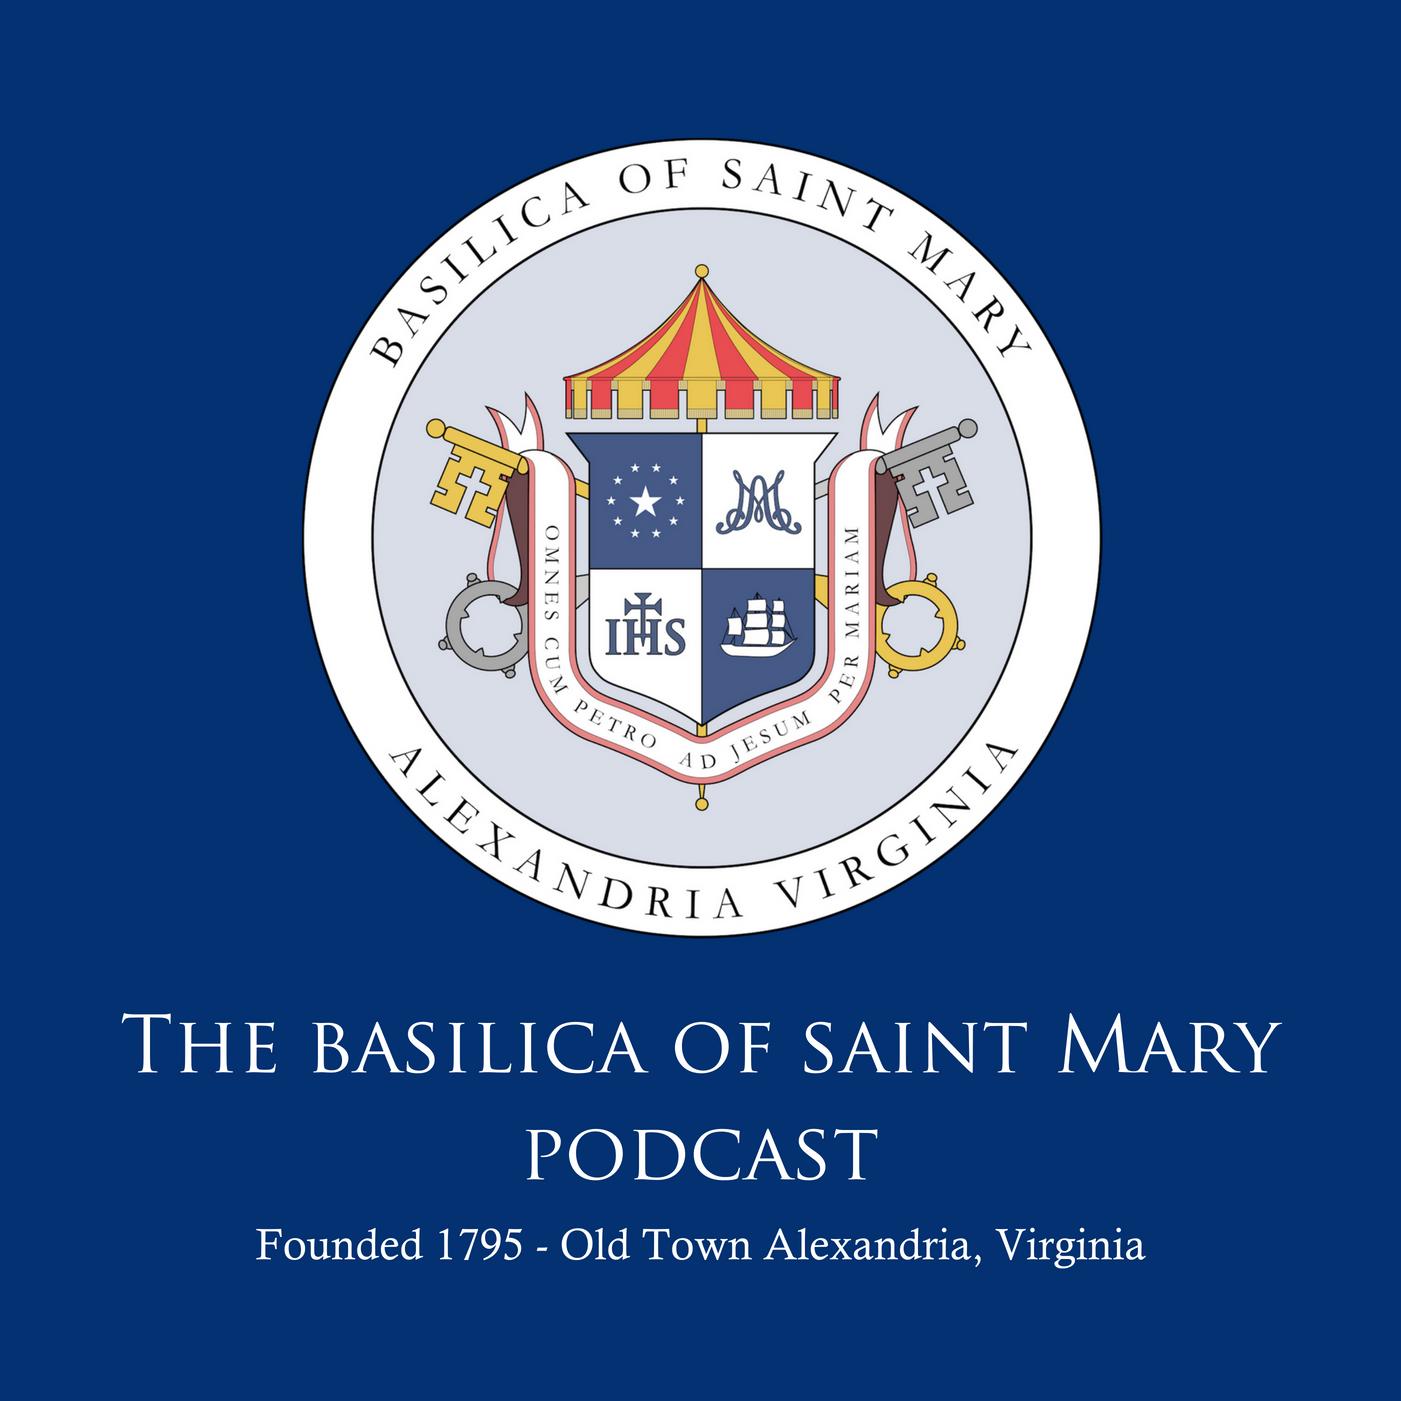 Basilica of Saint Mary Podcast show art